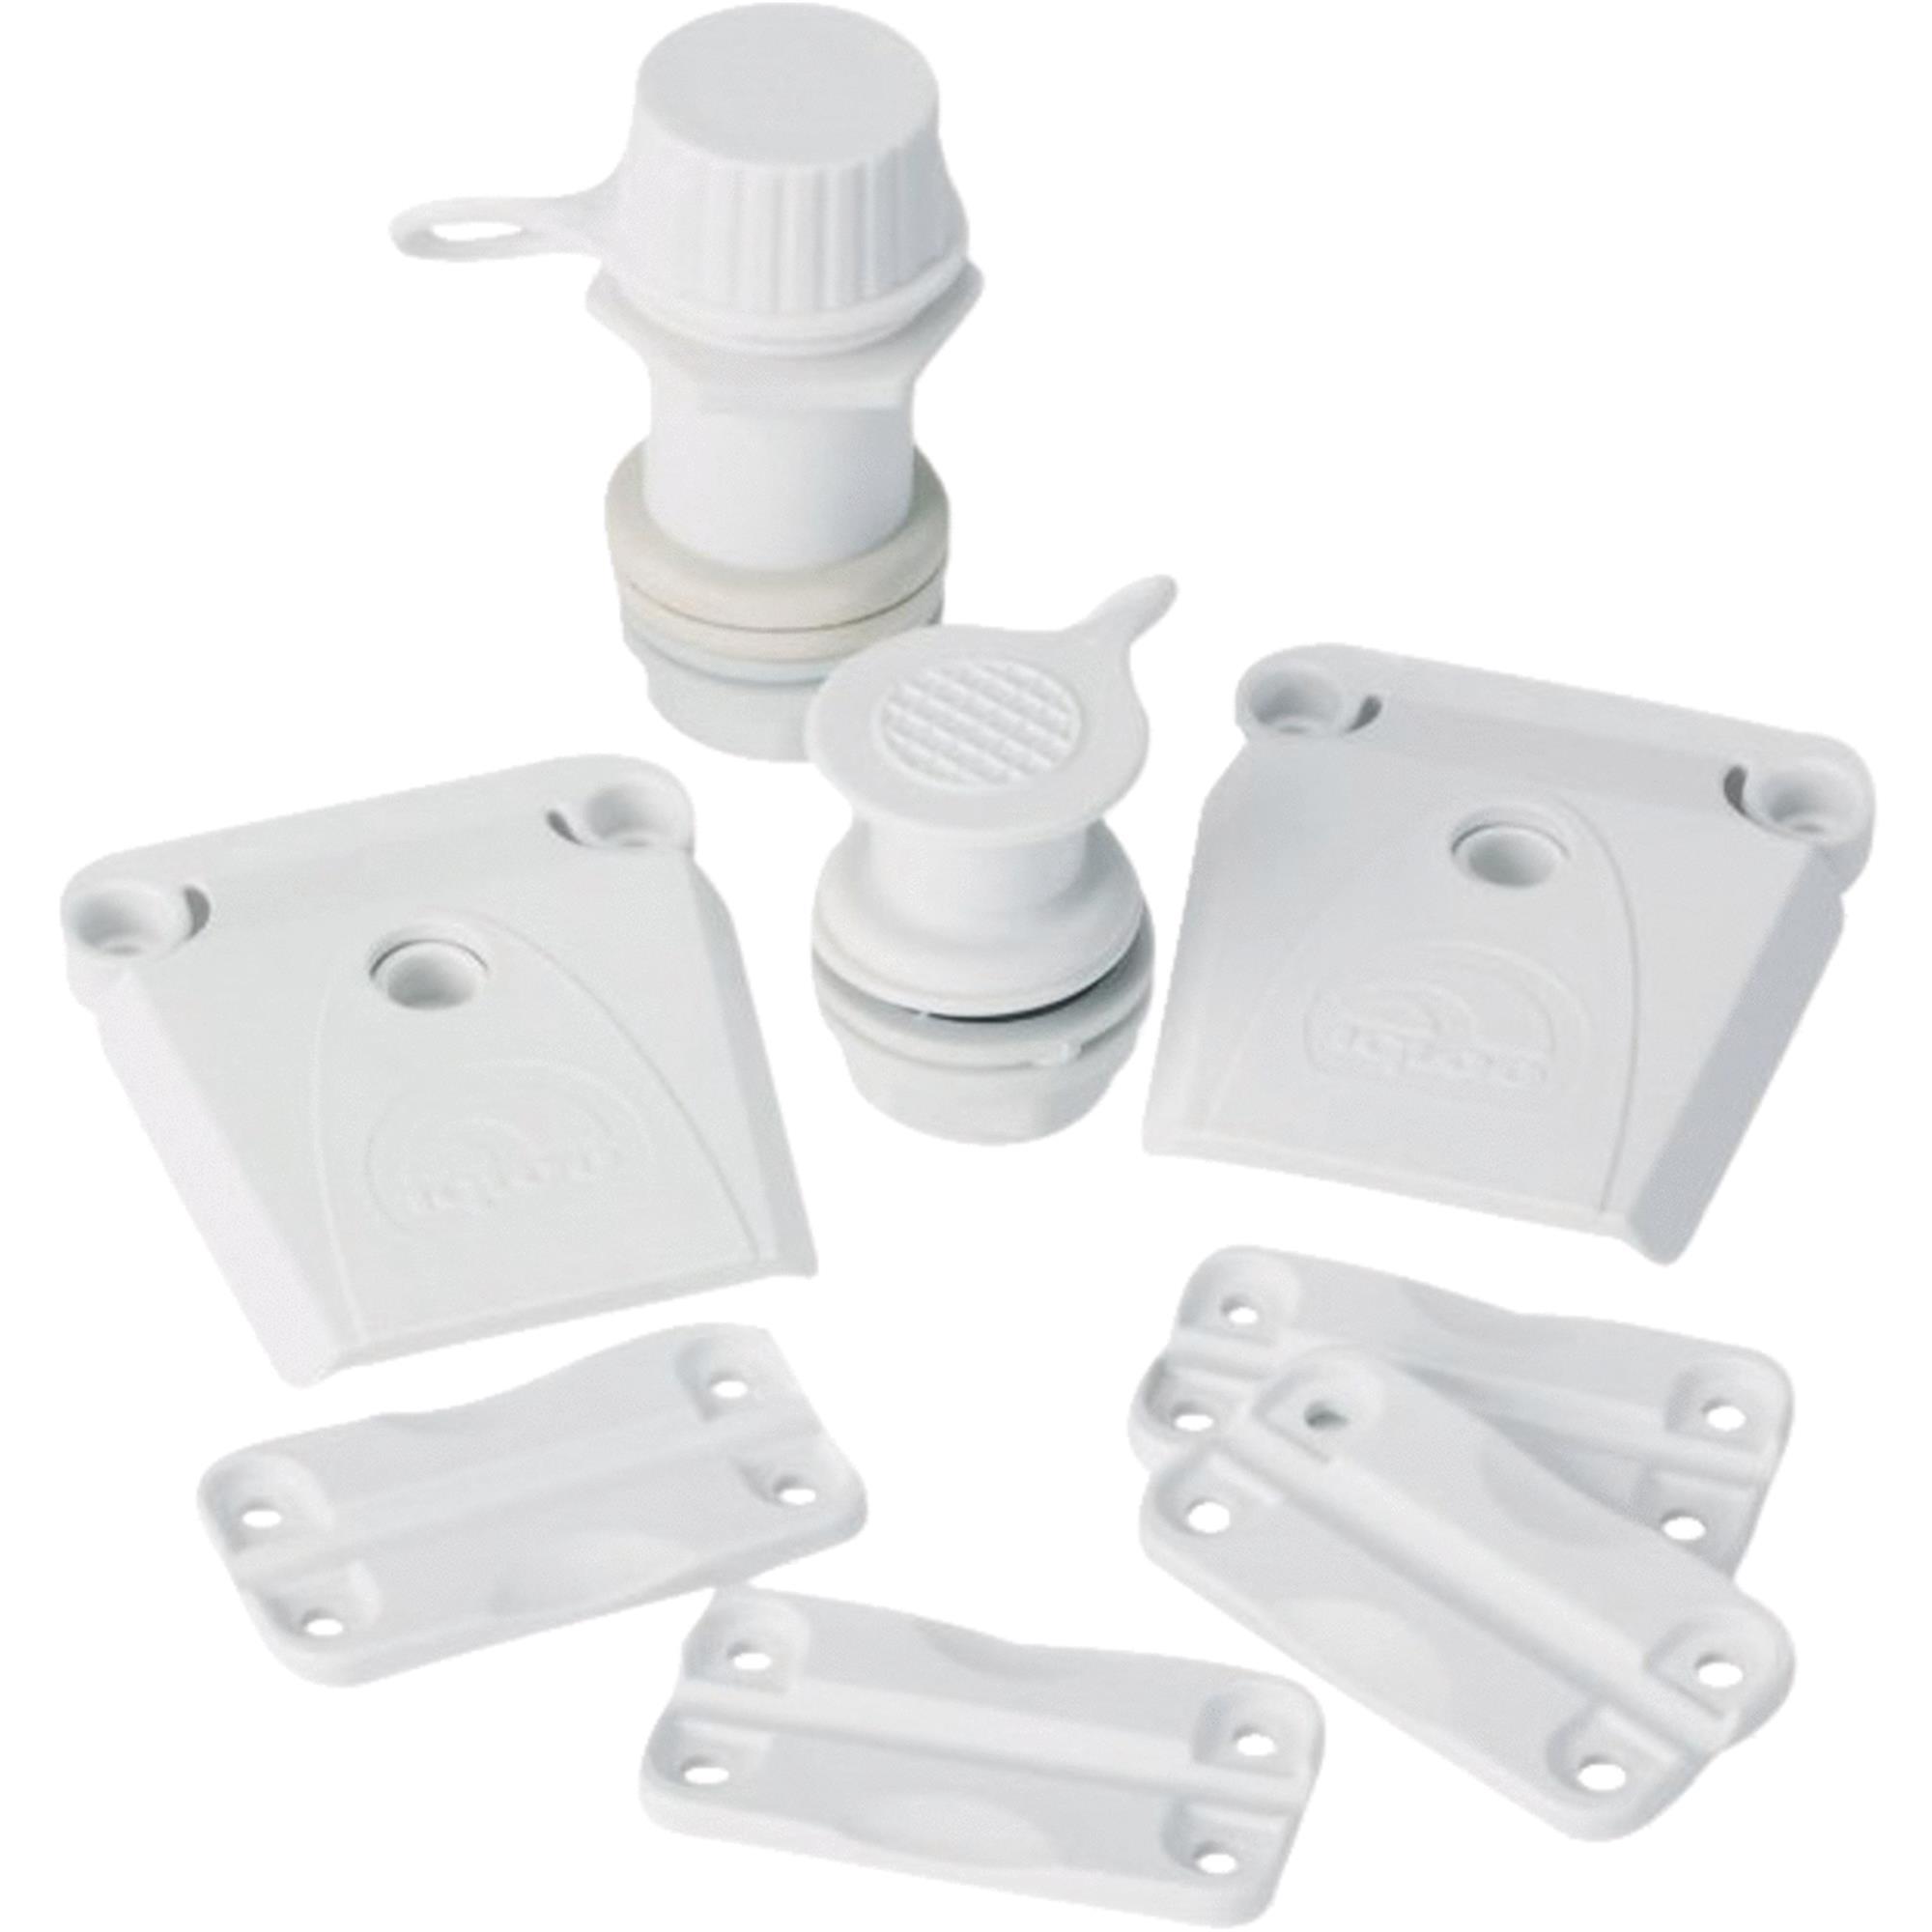 Igloo Cooler Parts Kit